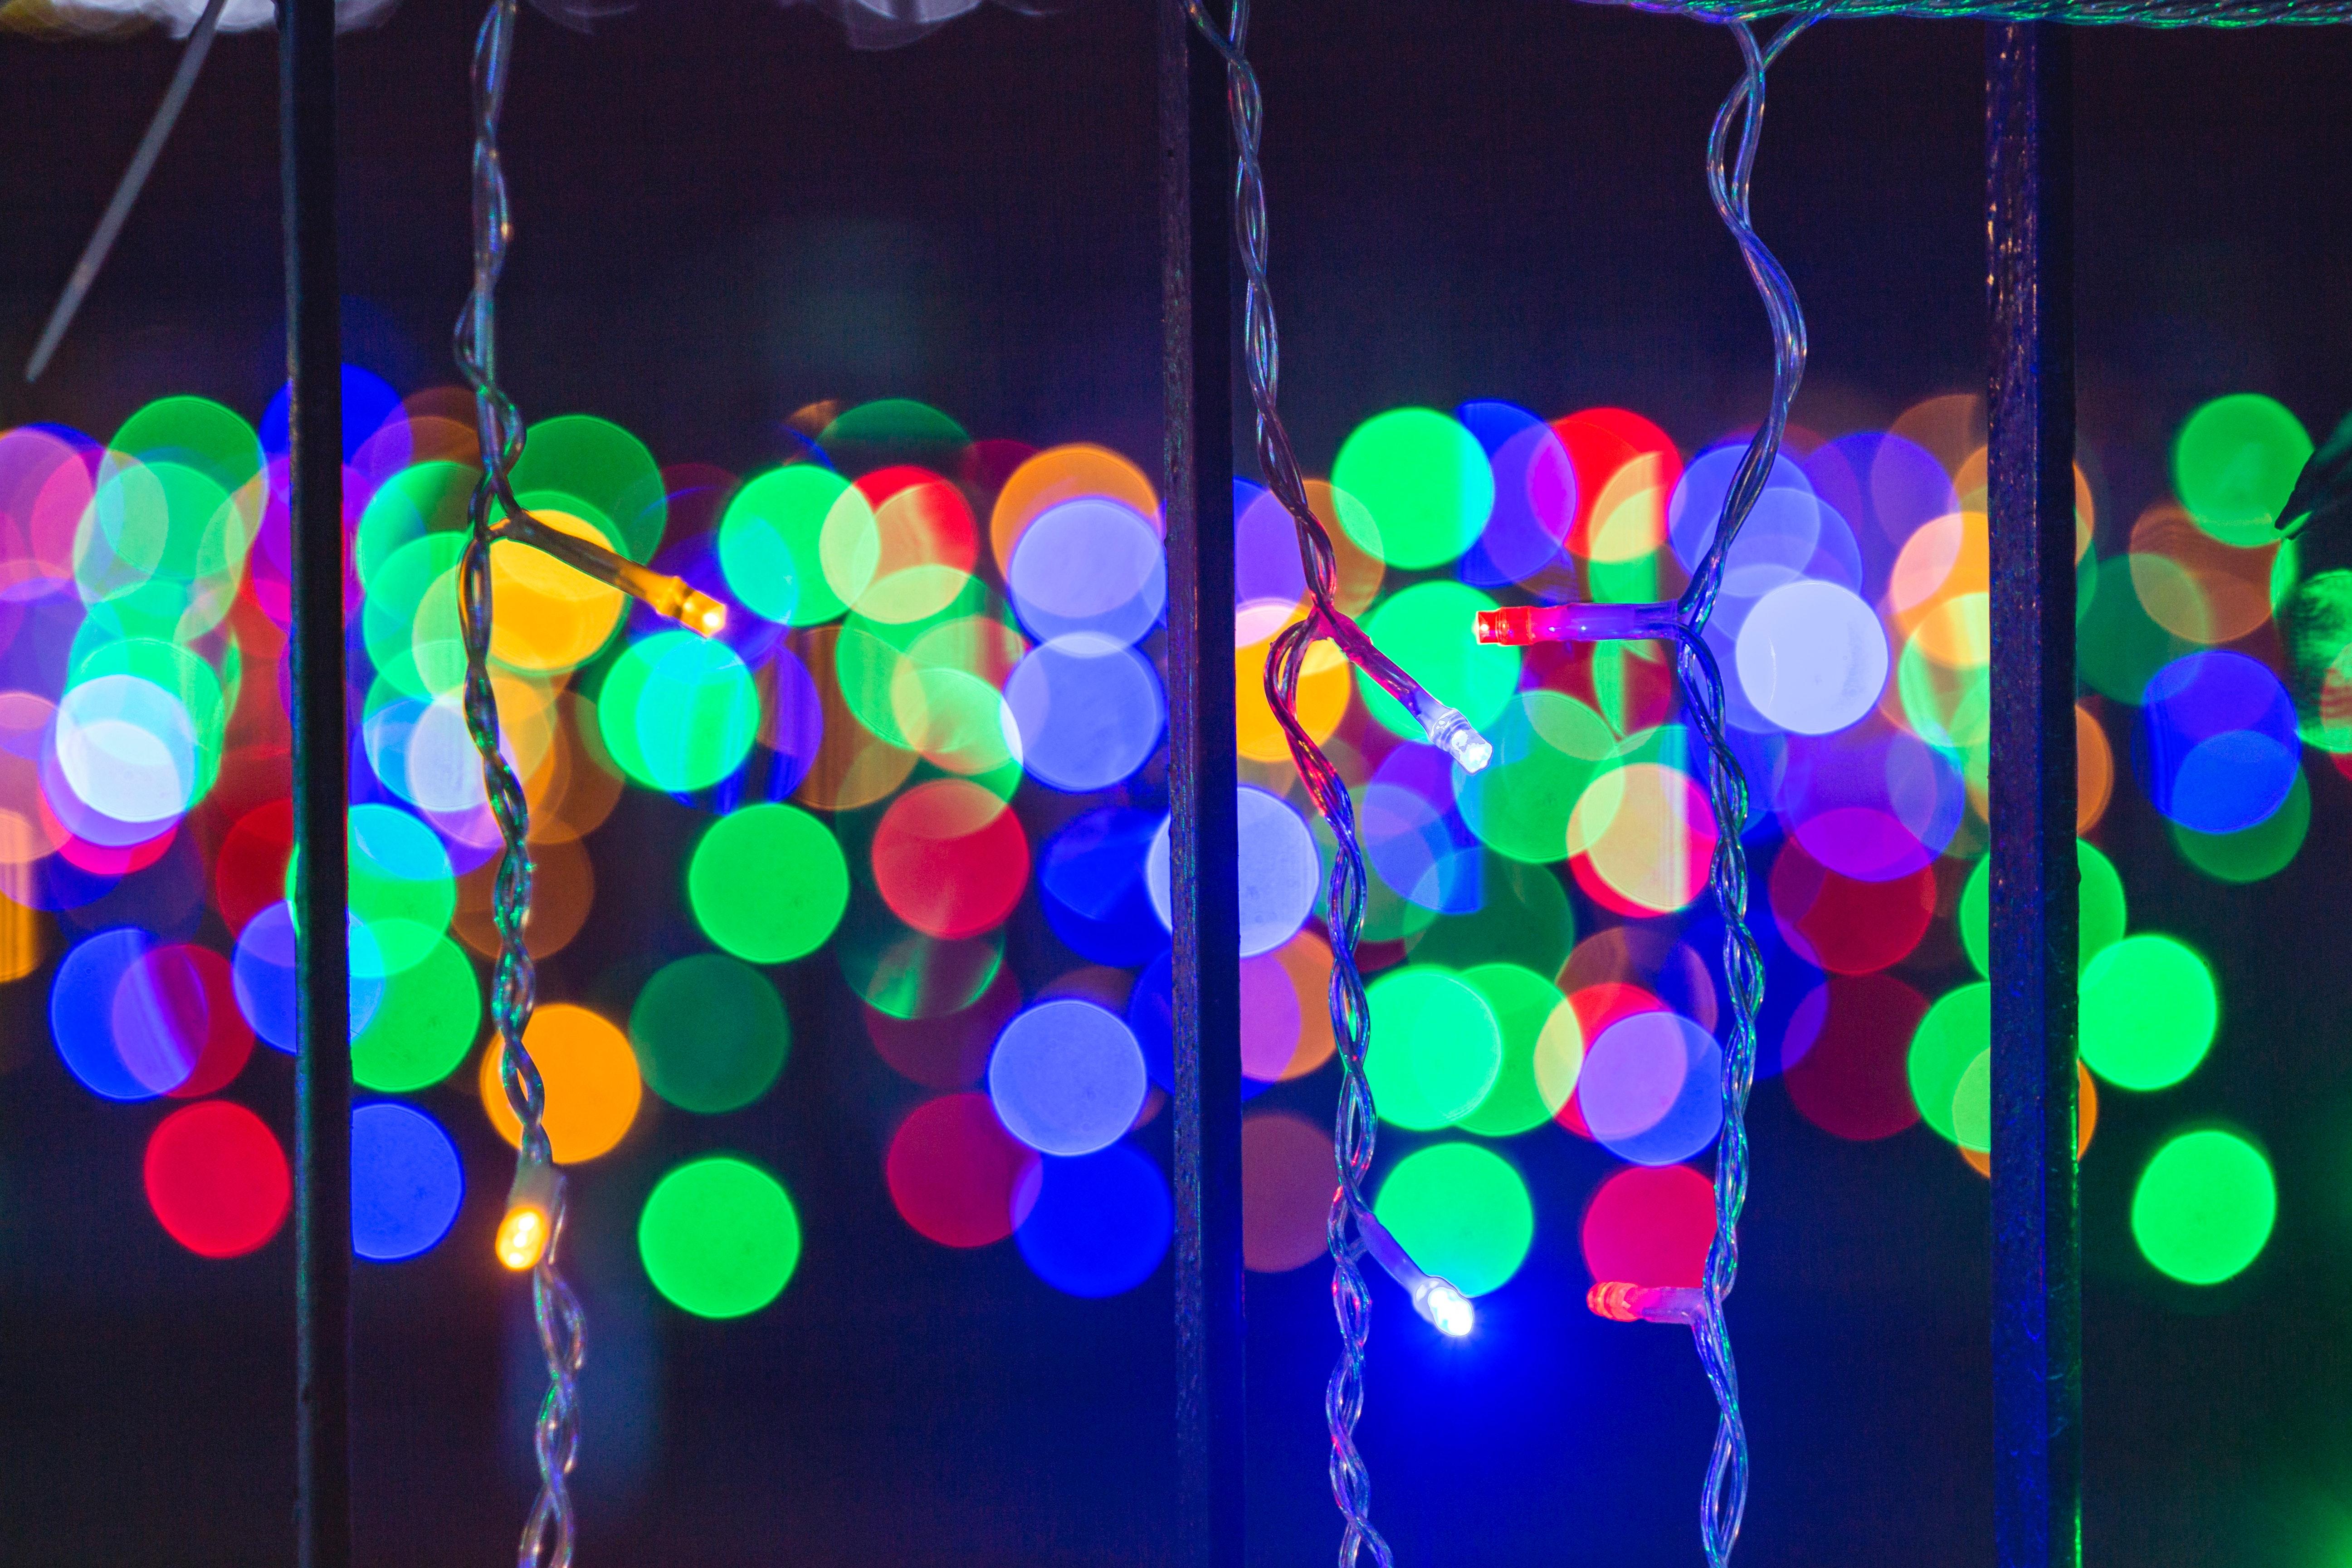 Fotos gratis : 4k fondos de pantalla, difuminar, Bokeh, brillante, Bombillas, celebracion, luces de Navidad, vistoso, decoración, atención, colgando, Papel pintado hd, iluminado, luminiscencia 5186x3457